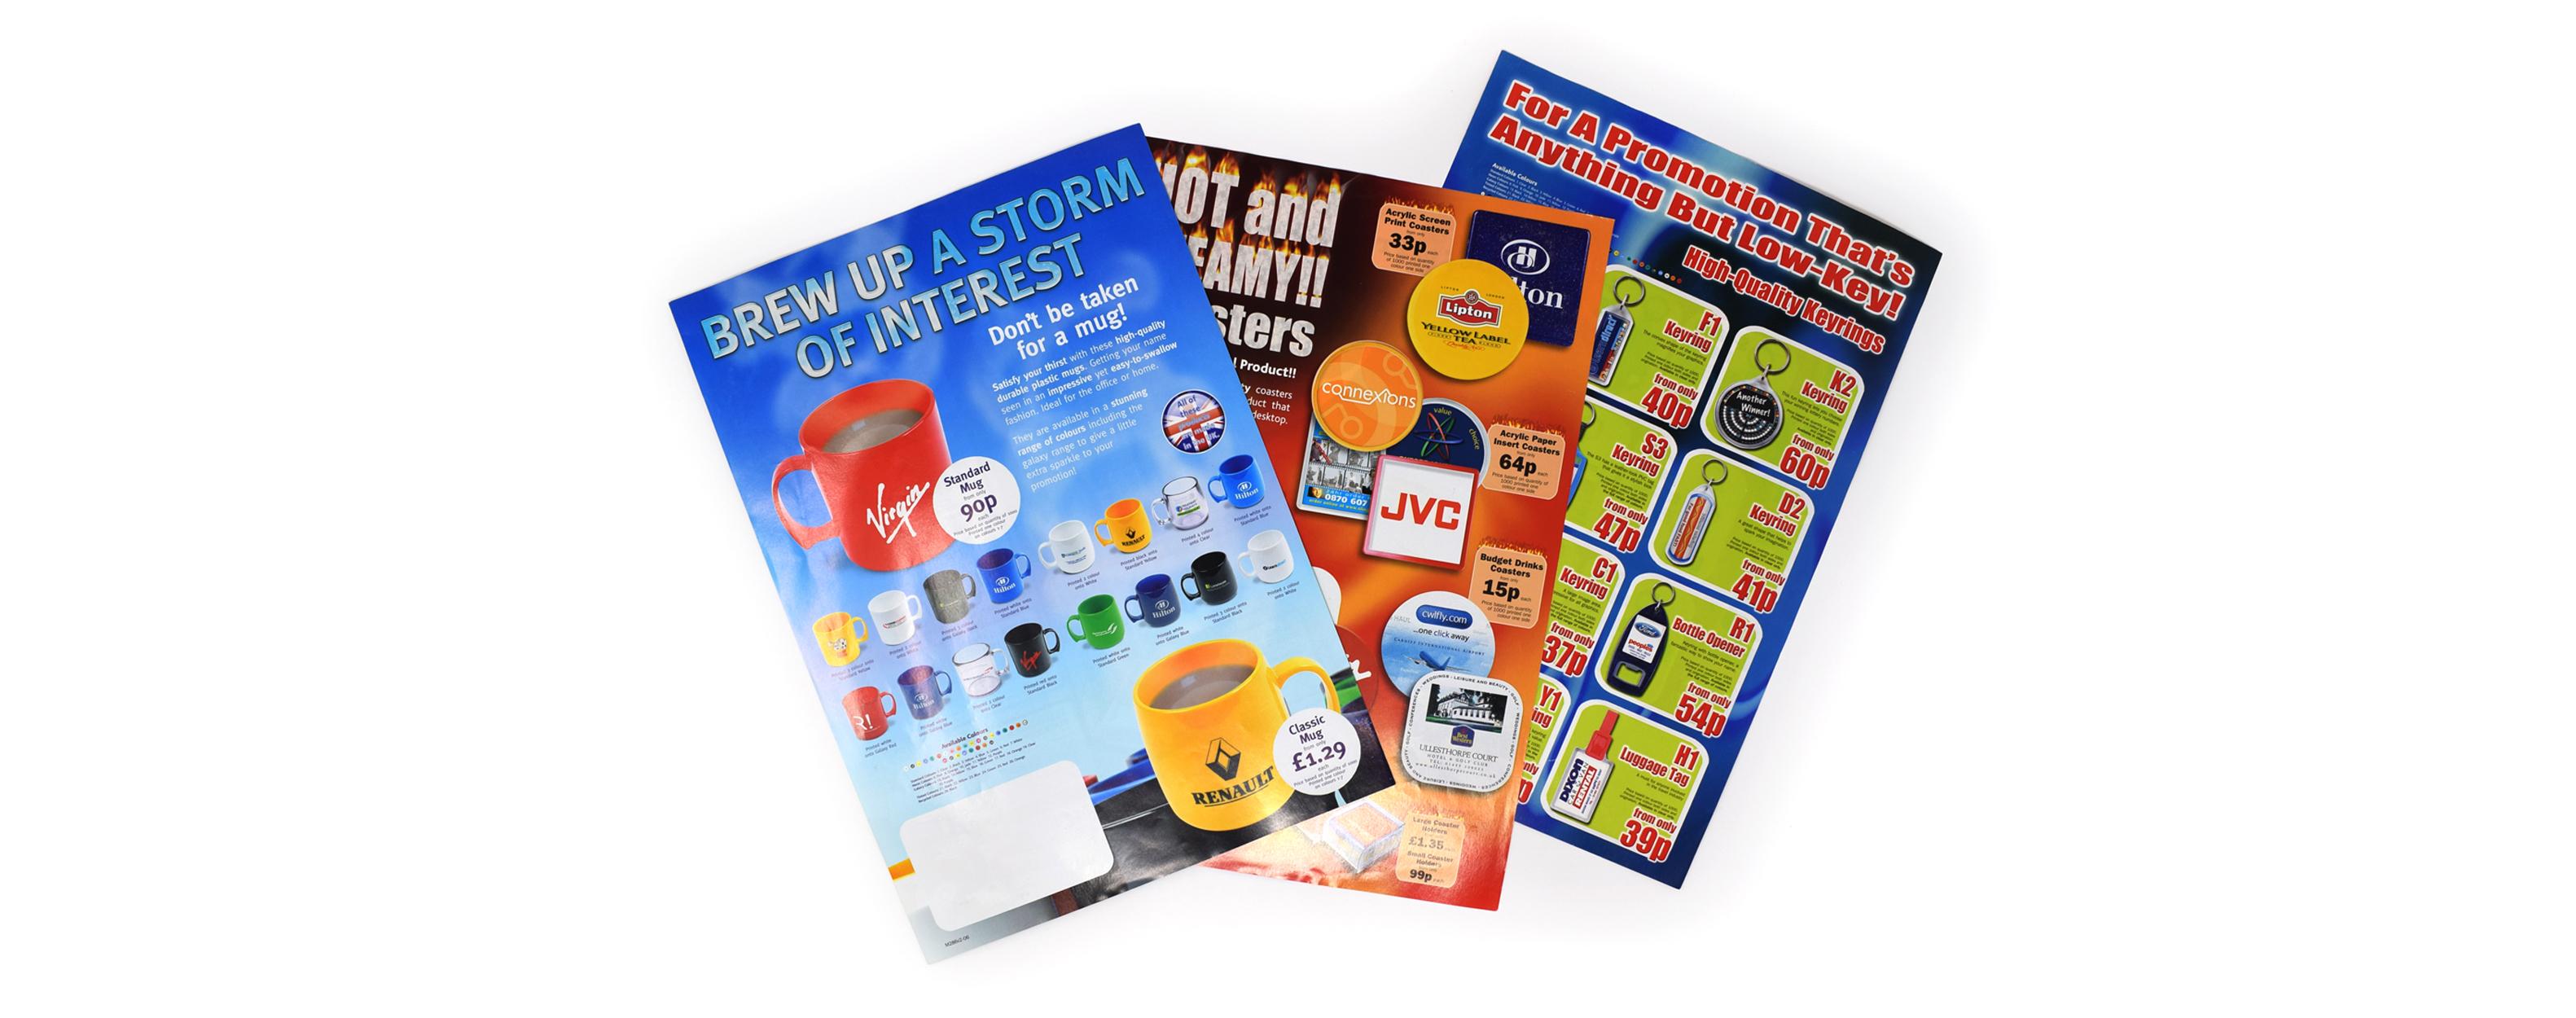 creative brochure online, create graphic design, creative agencies, creative agency design, blackbur